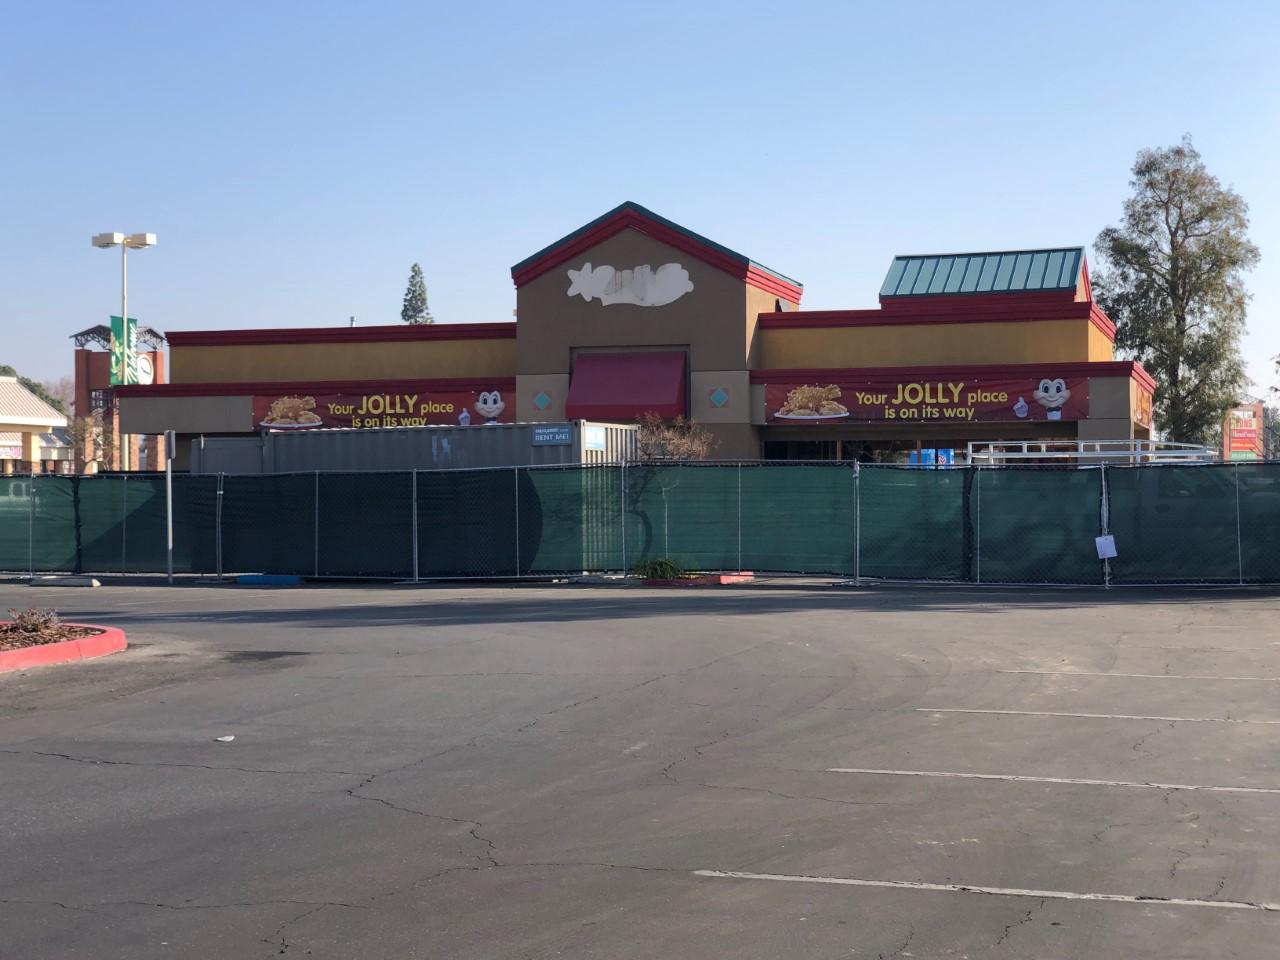 Filipino fast food chain Jollibee coming soon to Bakersfield